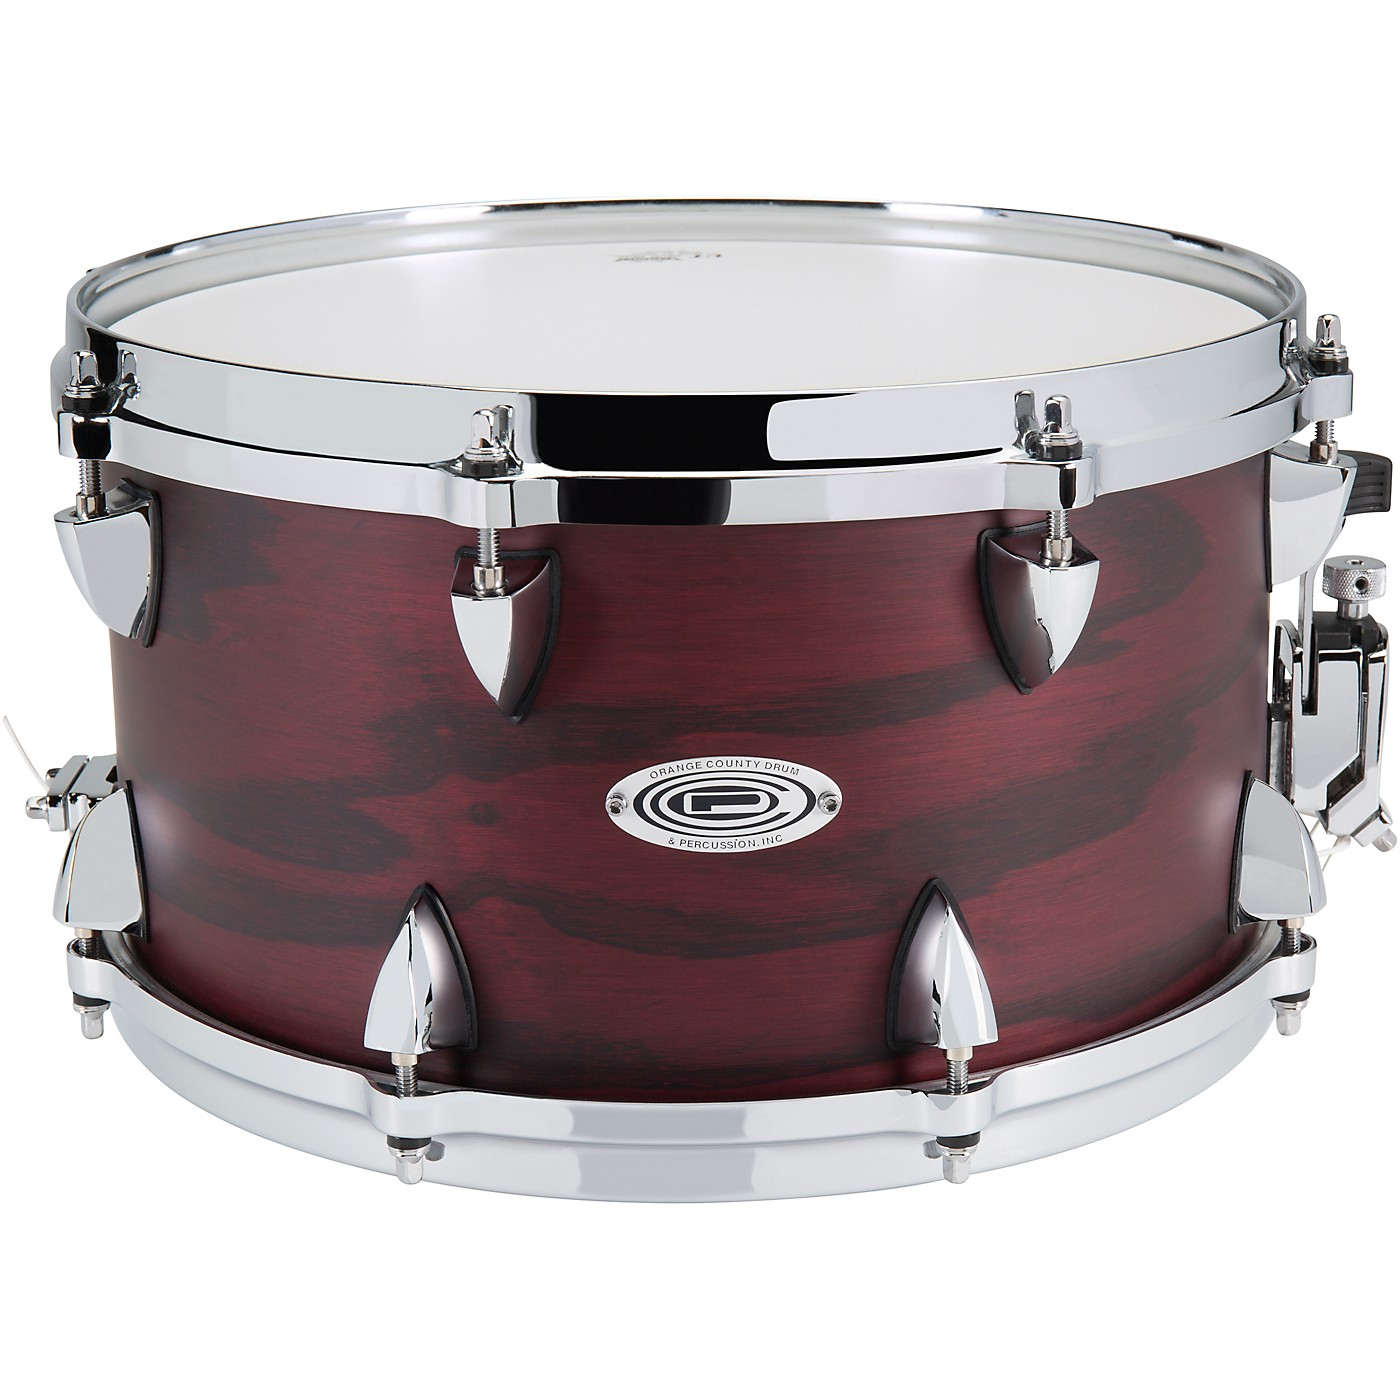 Orange County Drum & Percussion Maple Ash Snare Drum thumbnail